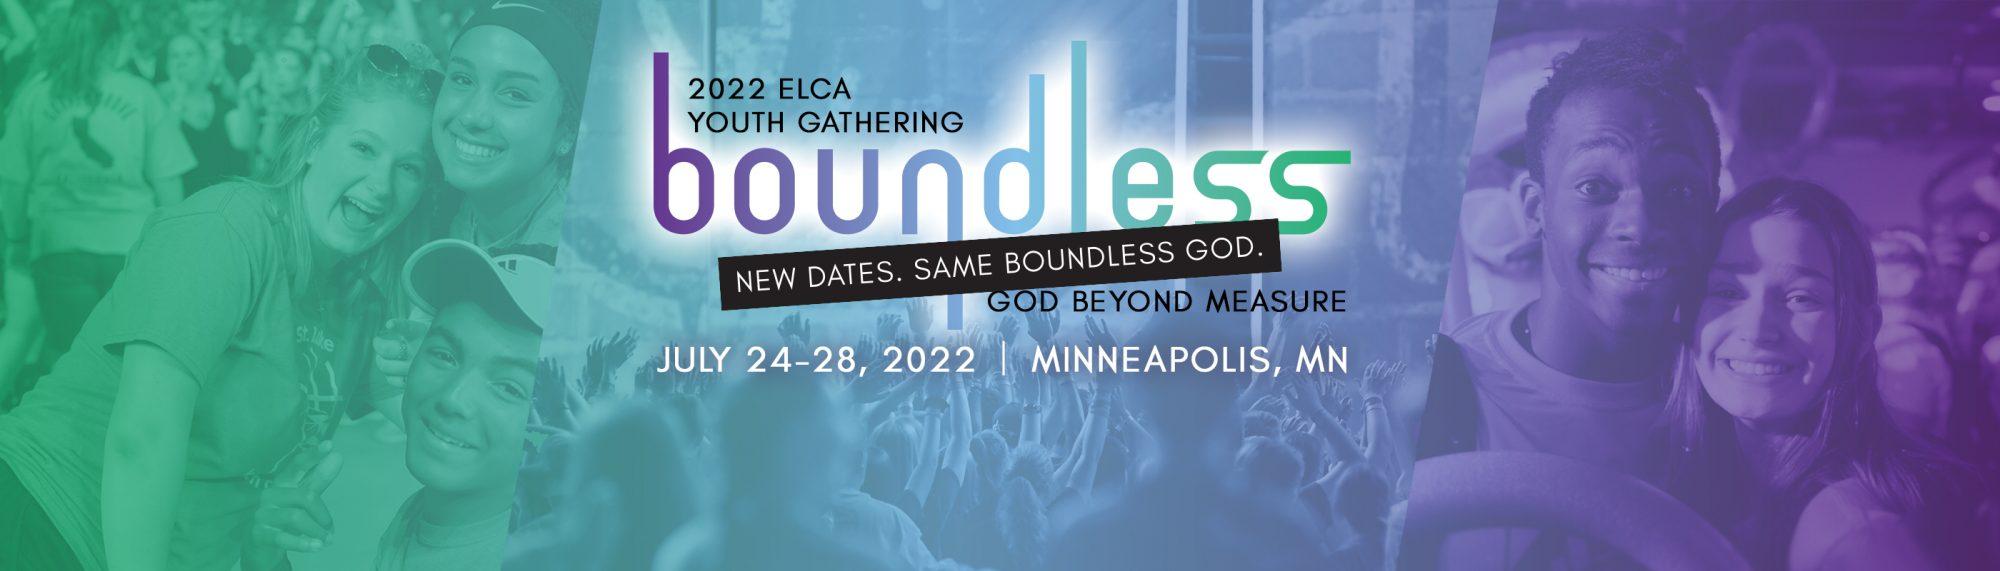 ELCA Youth Gathering 2022 – BOUNDLESS